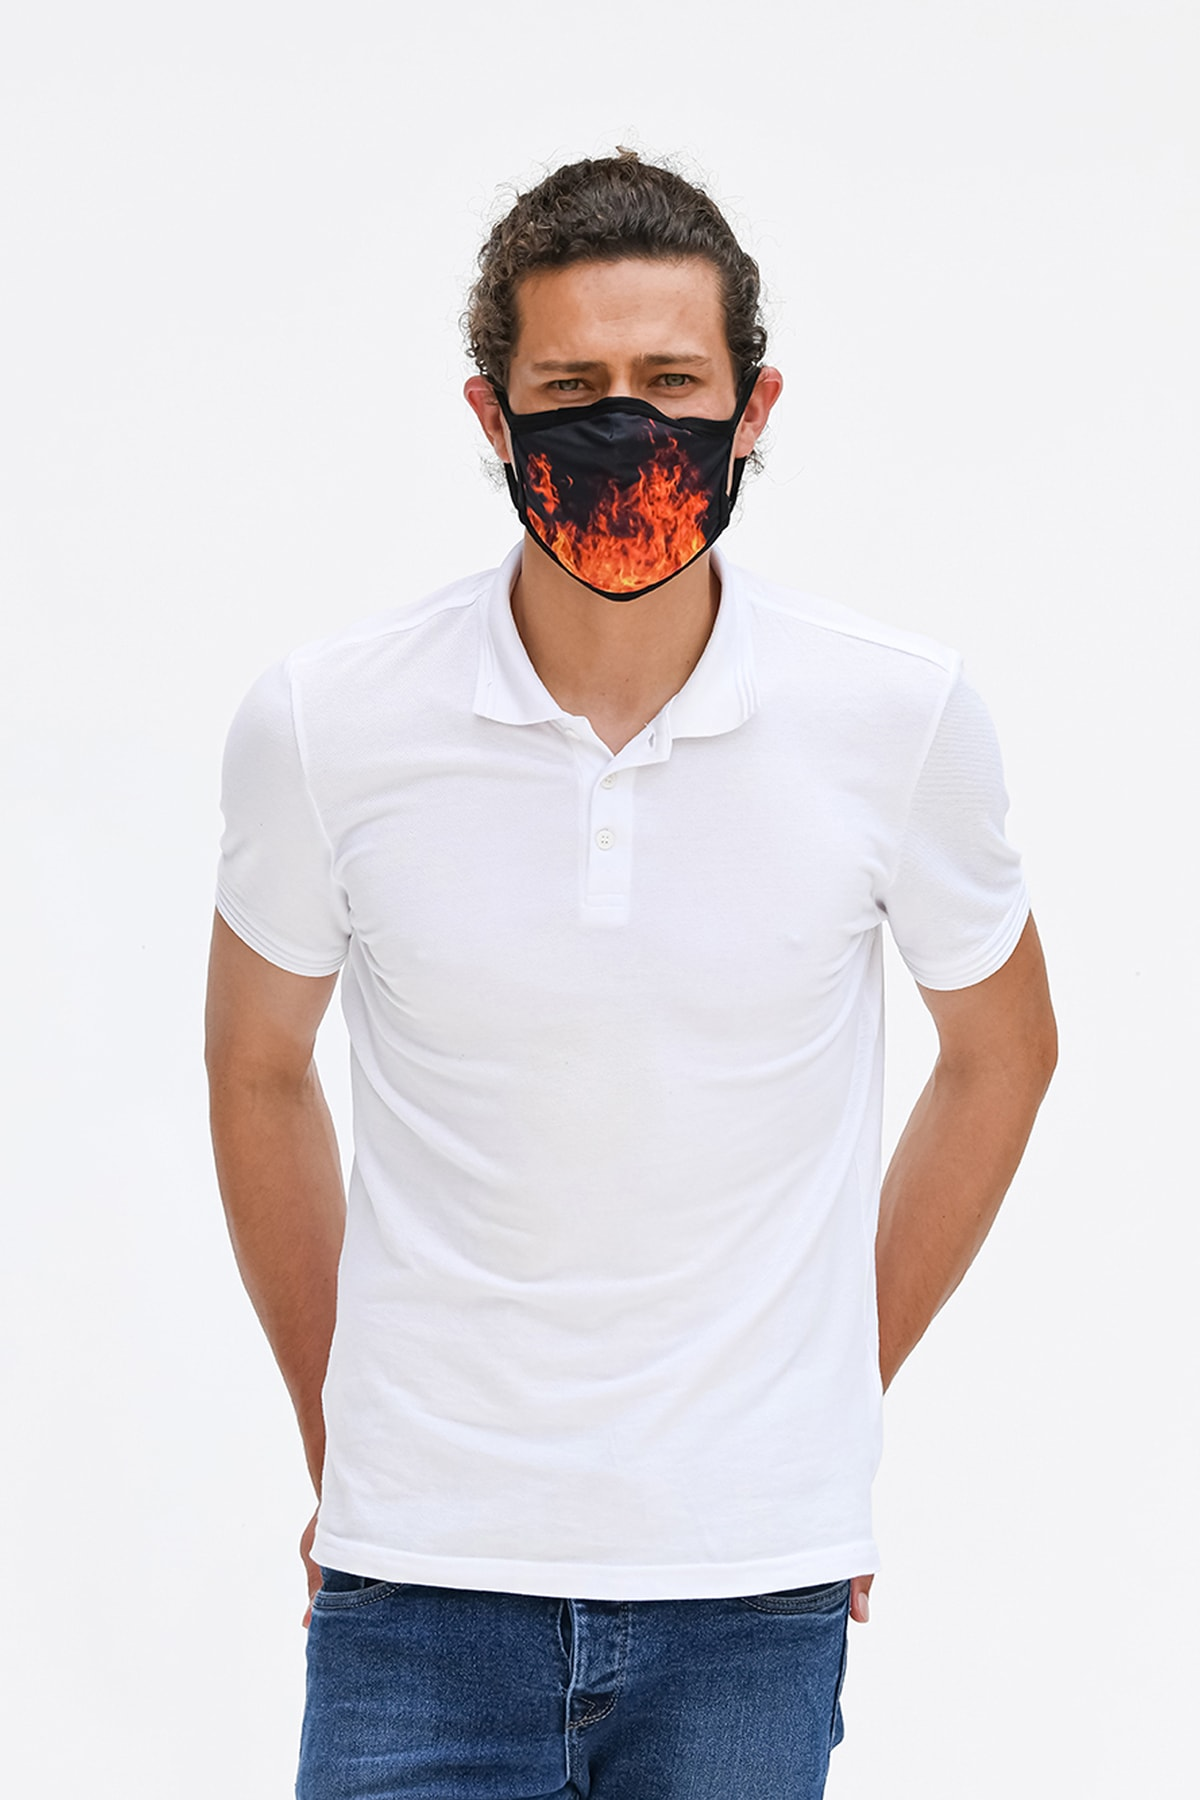 Etnik Esintiler TM028M Maske Fıre